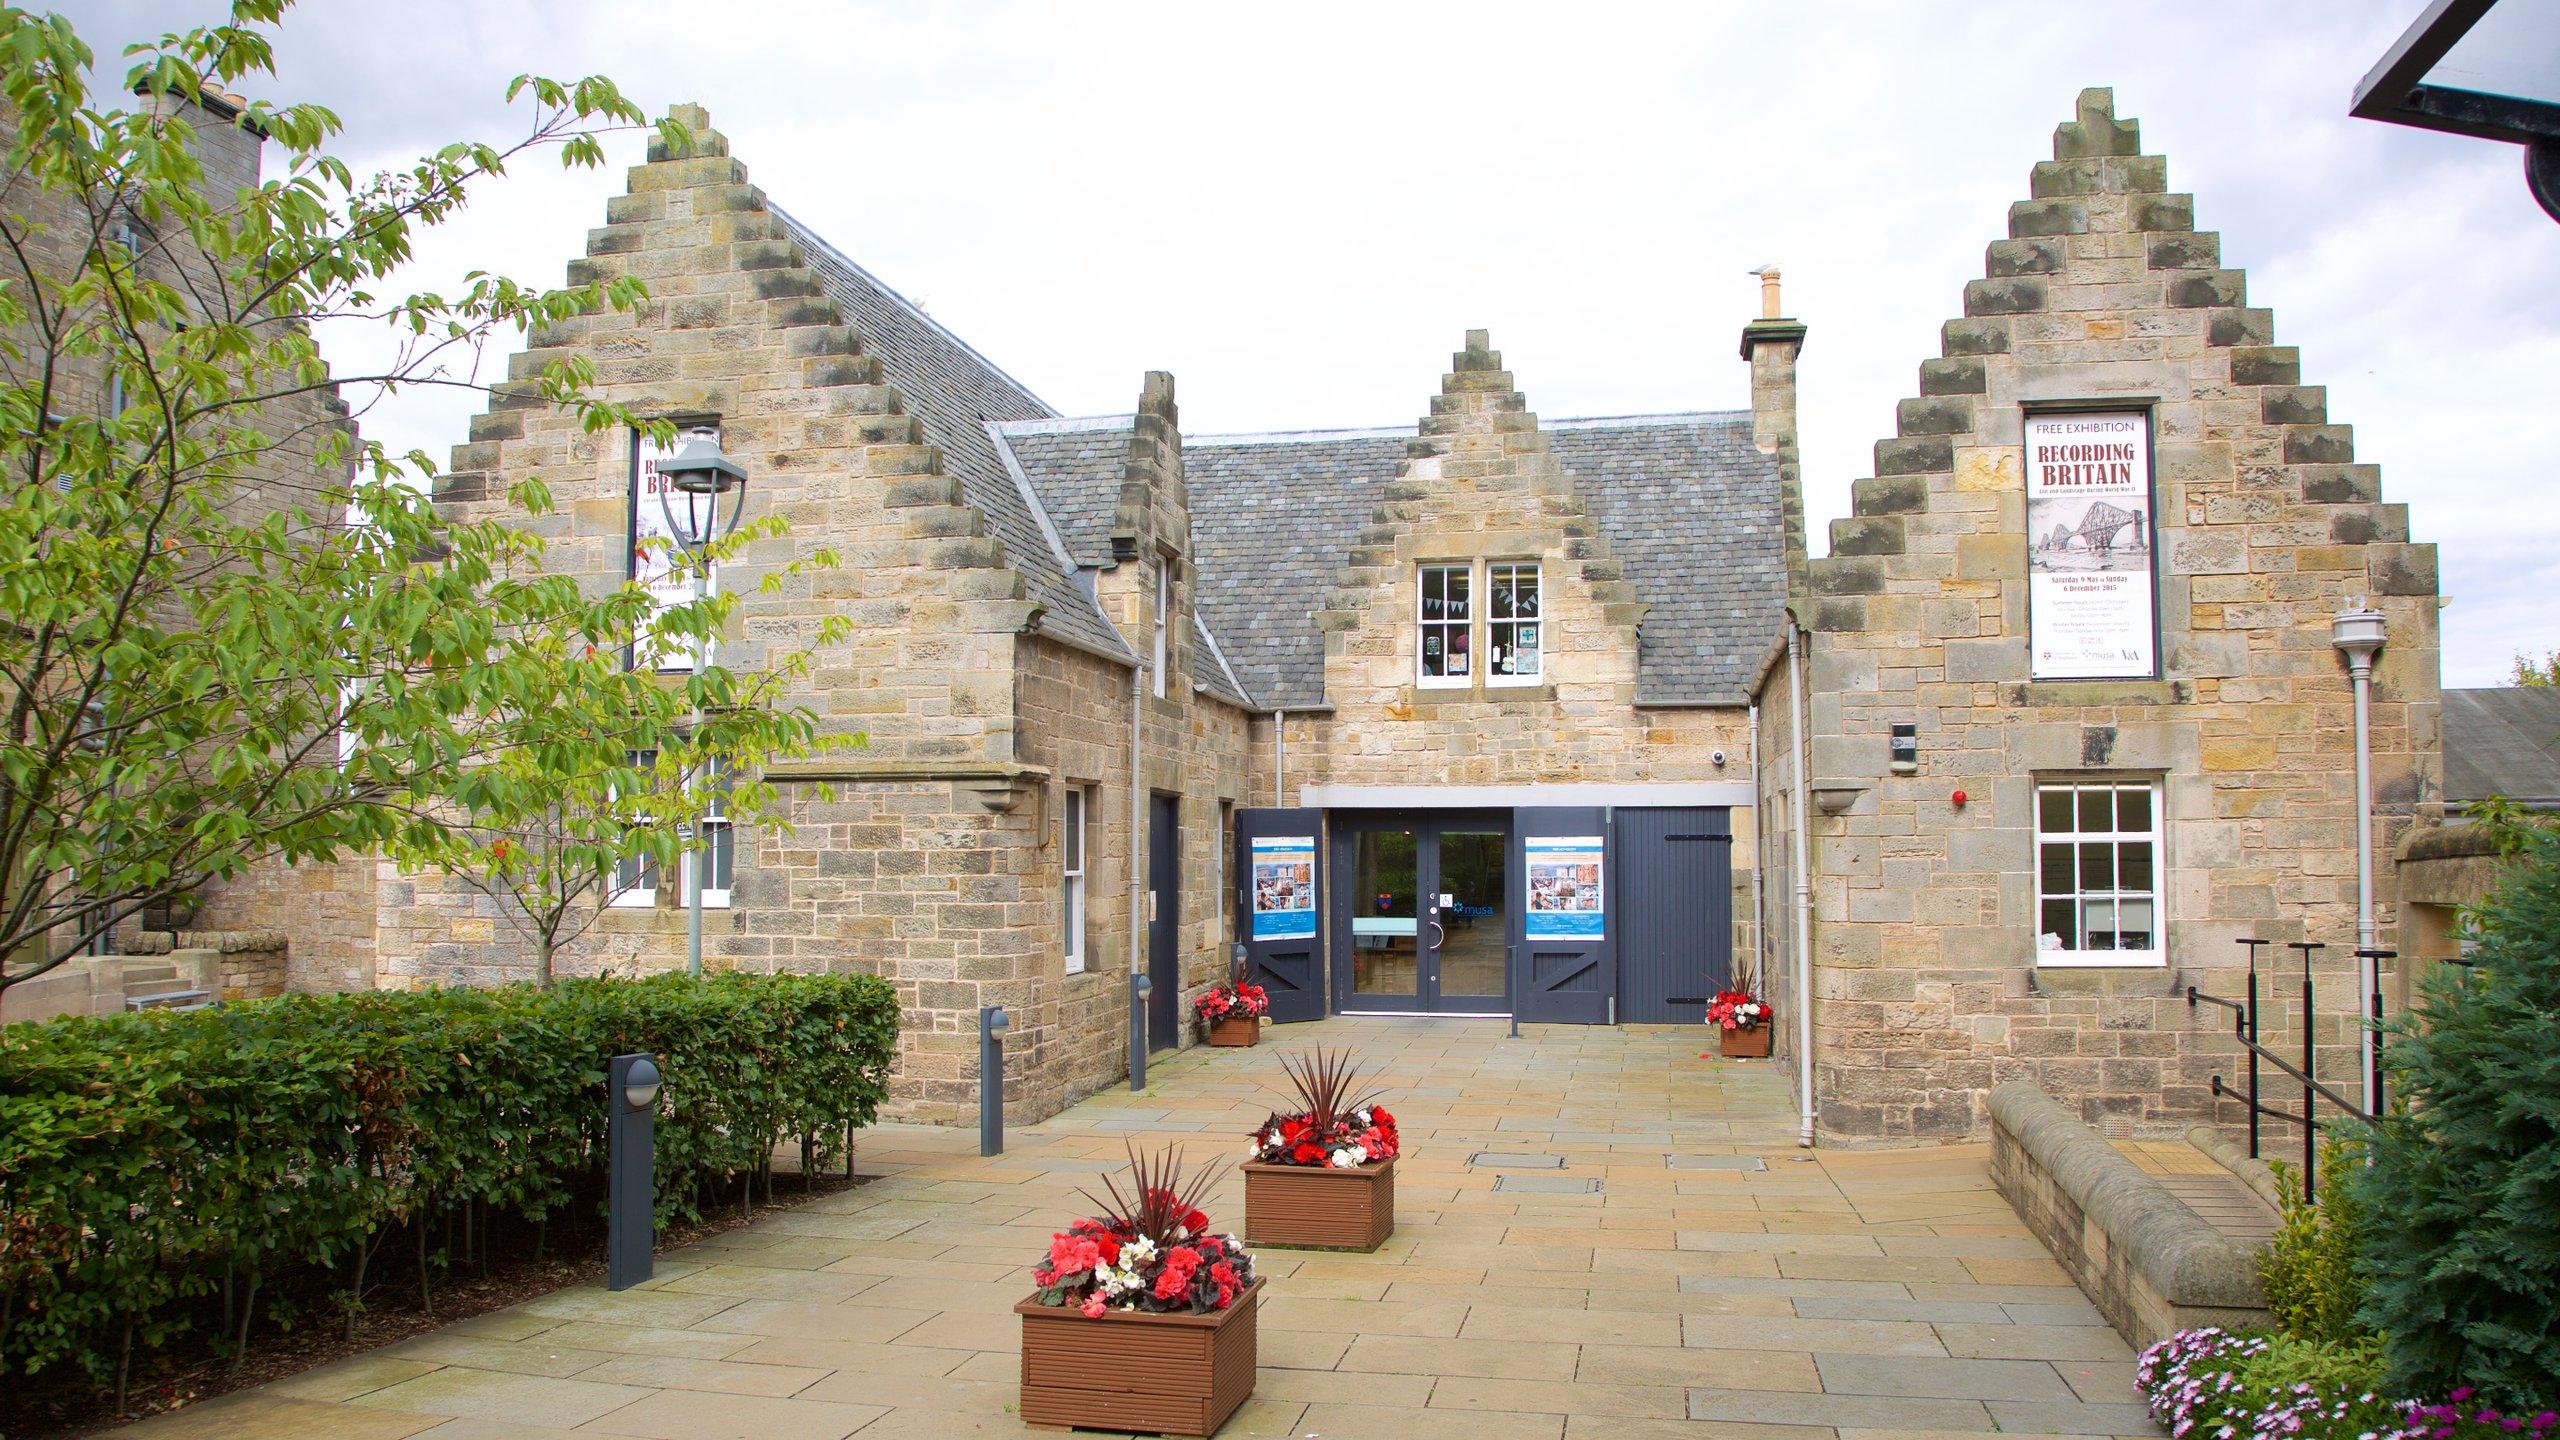 University of St. Andrews, St. Andrews, Scotland, United Kingdom